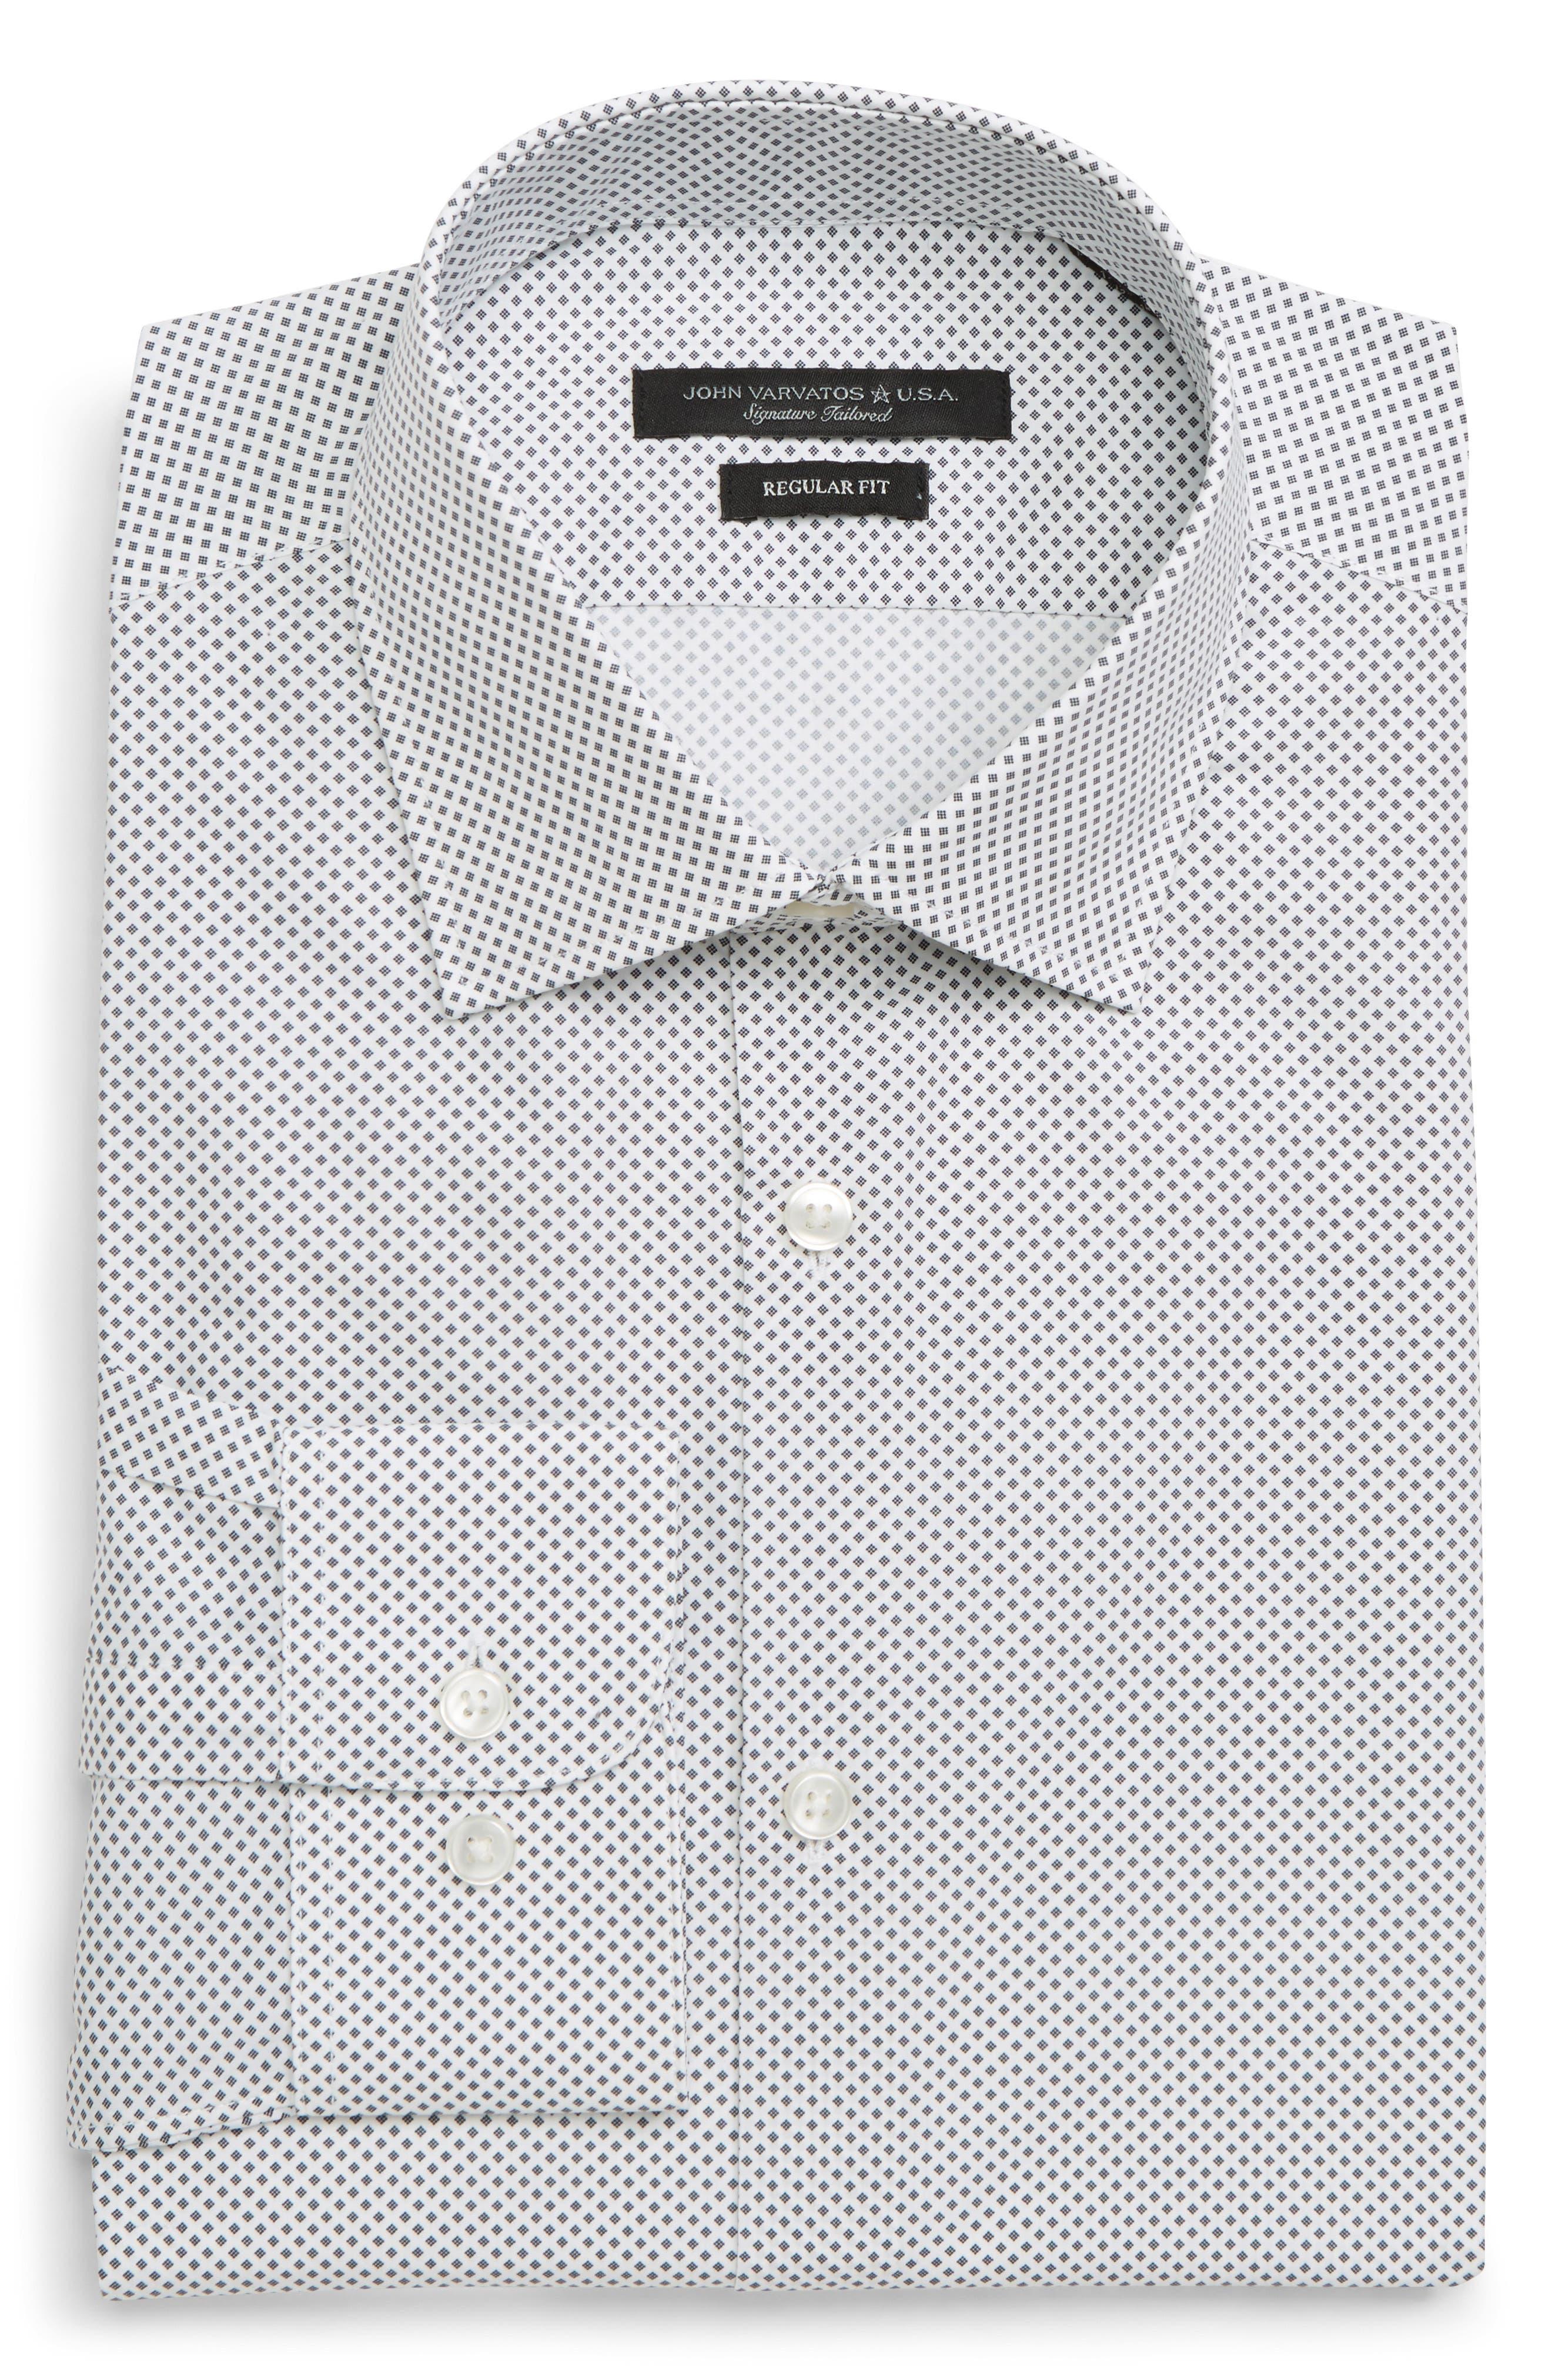 Regular Fit Geometric Dress Shirt,                             Alternate thumbnail 5, color,                             THUNDER GREY